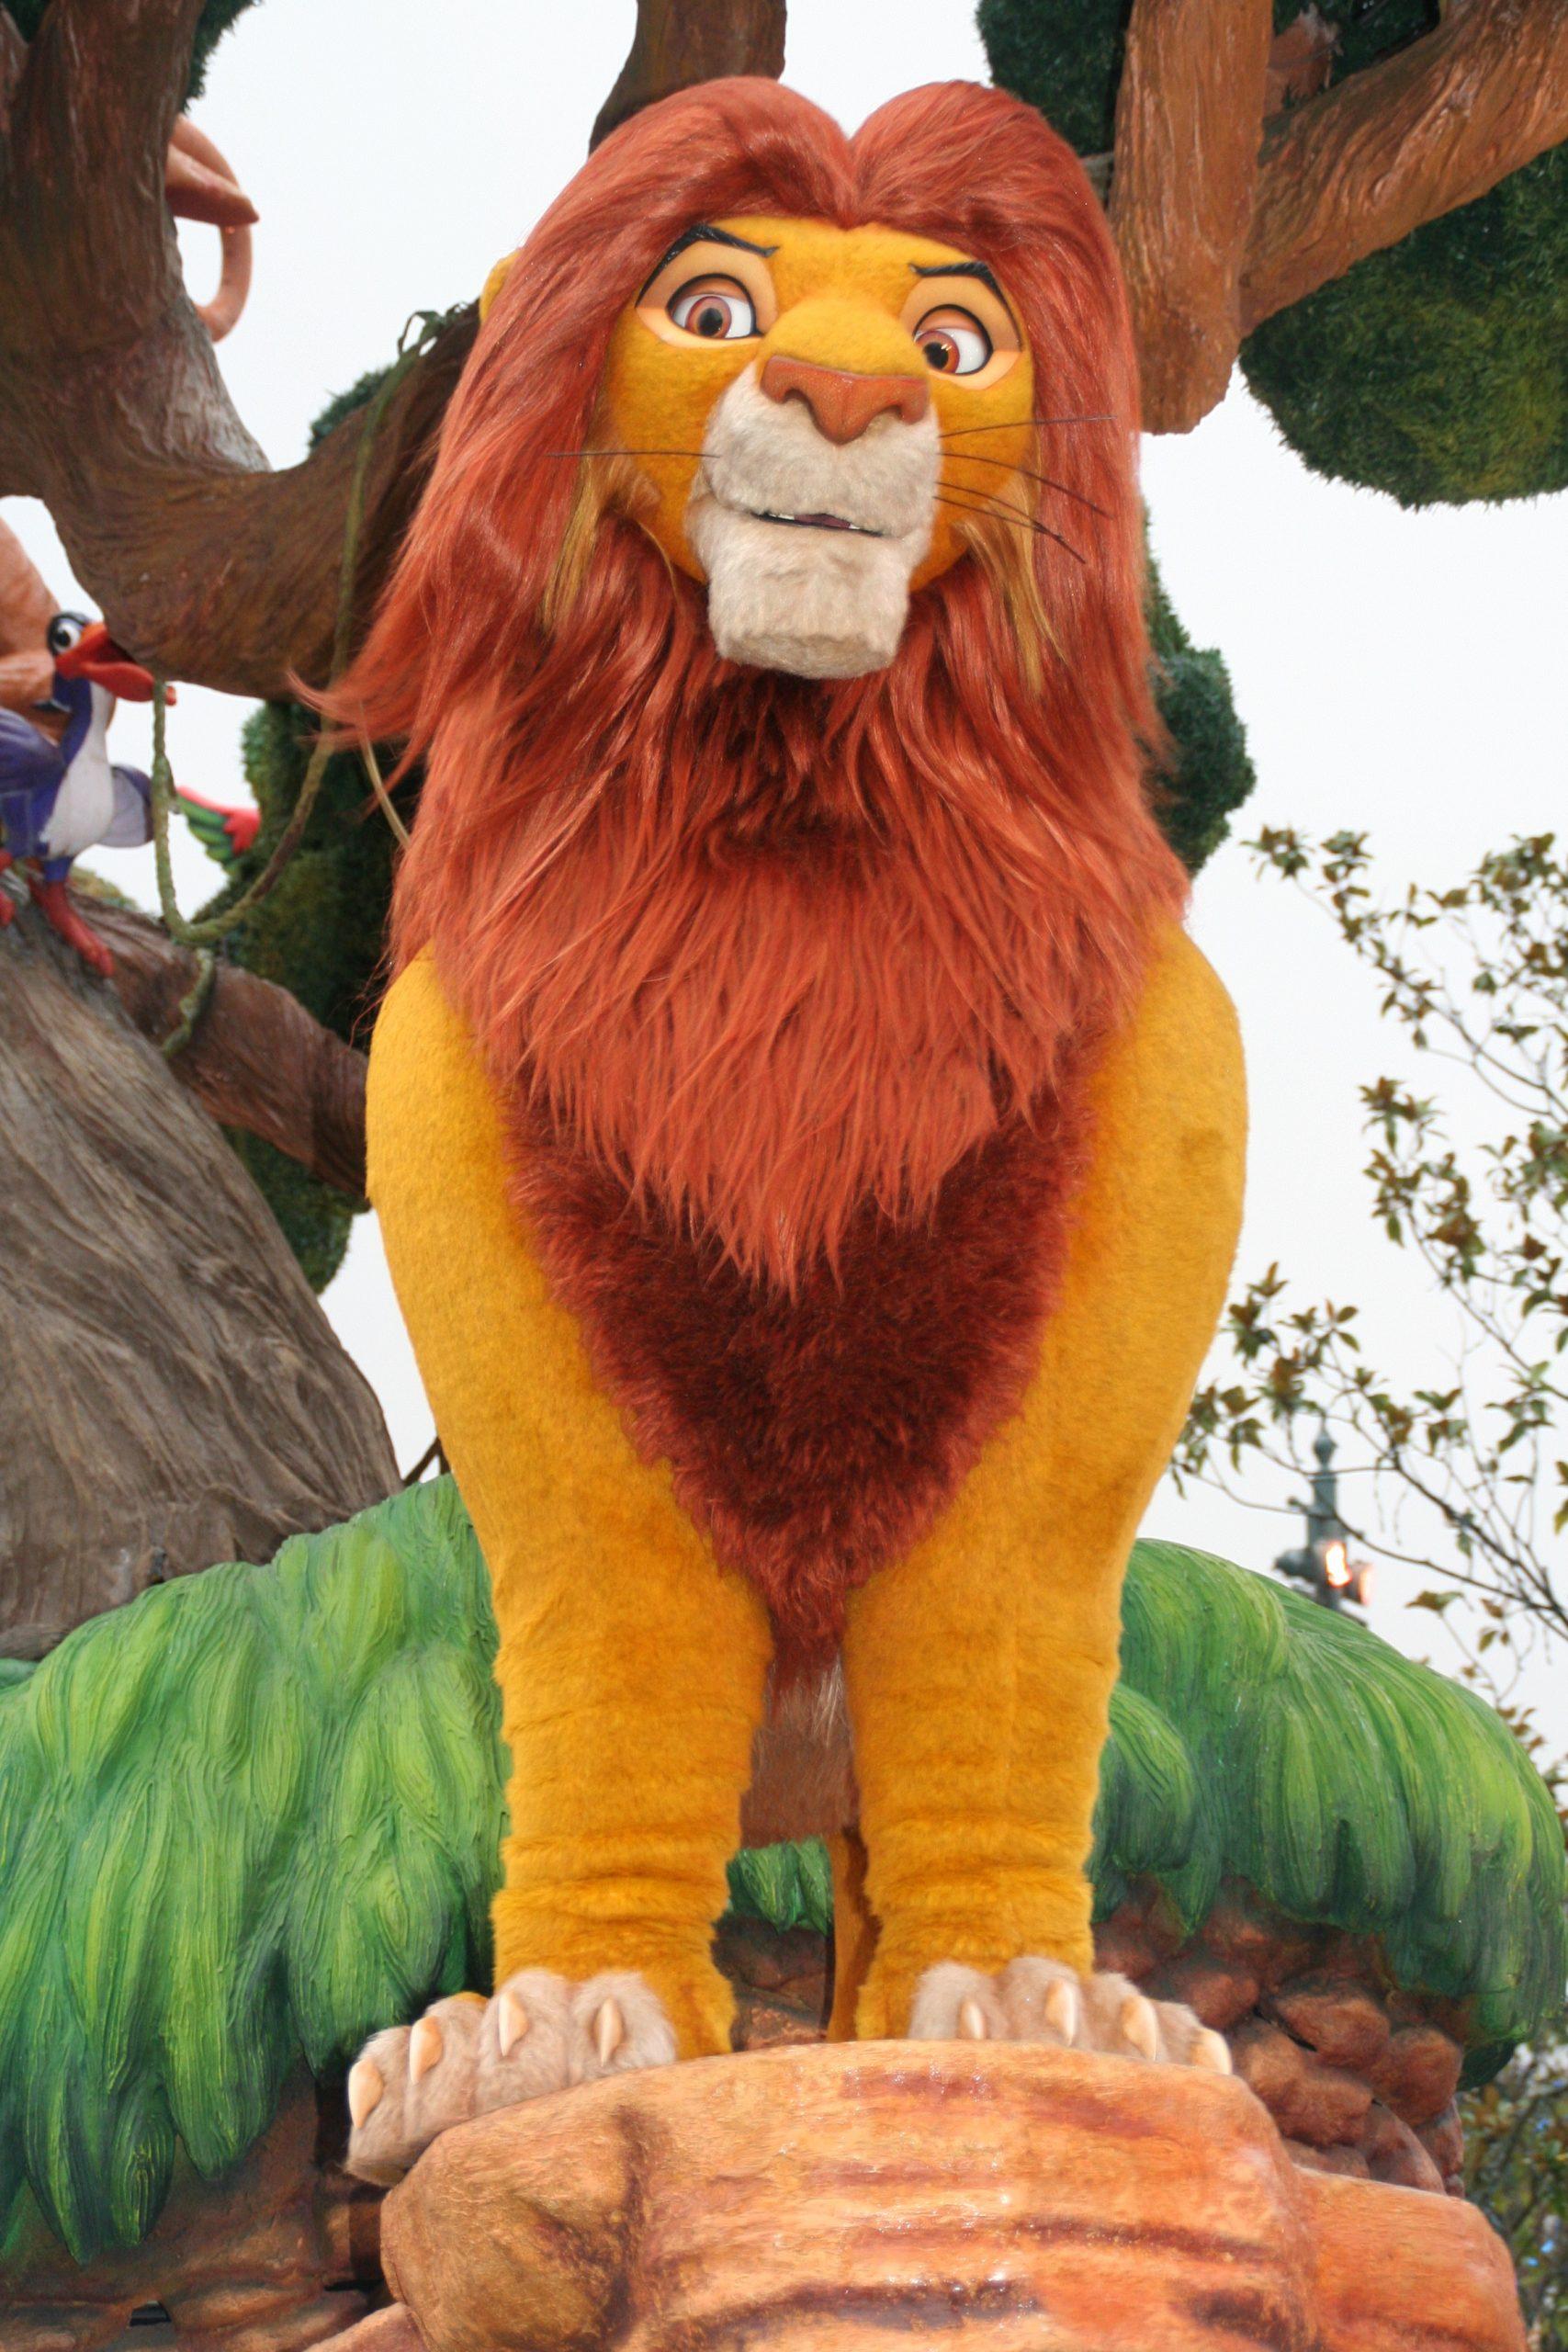 mufasa toy